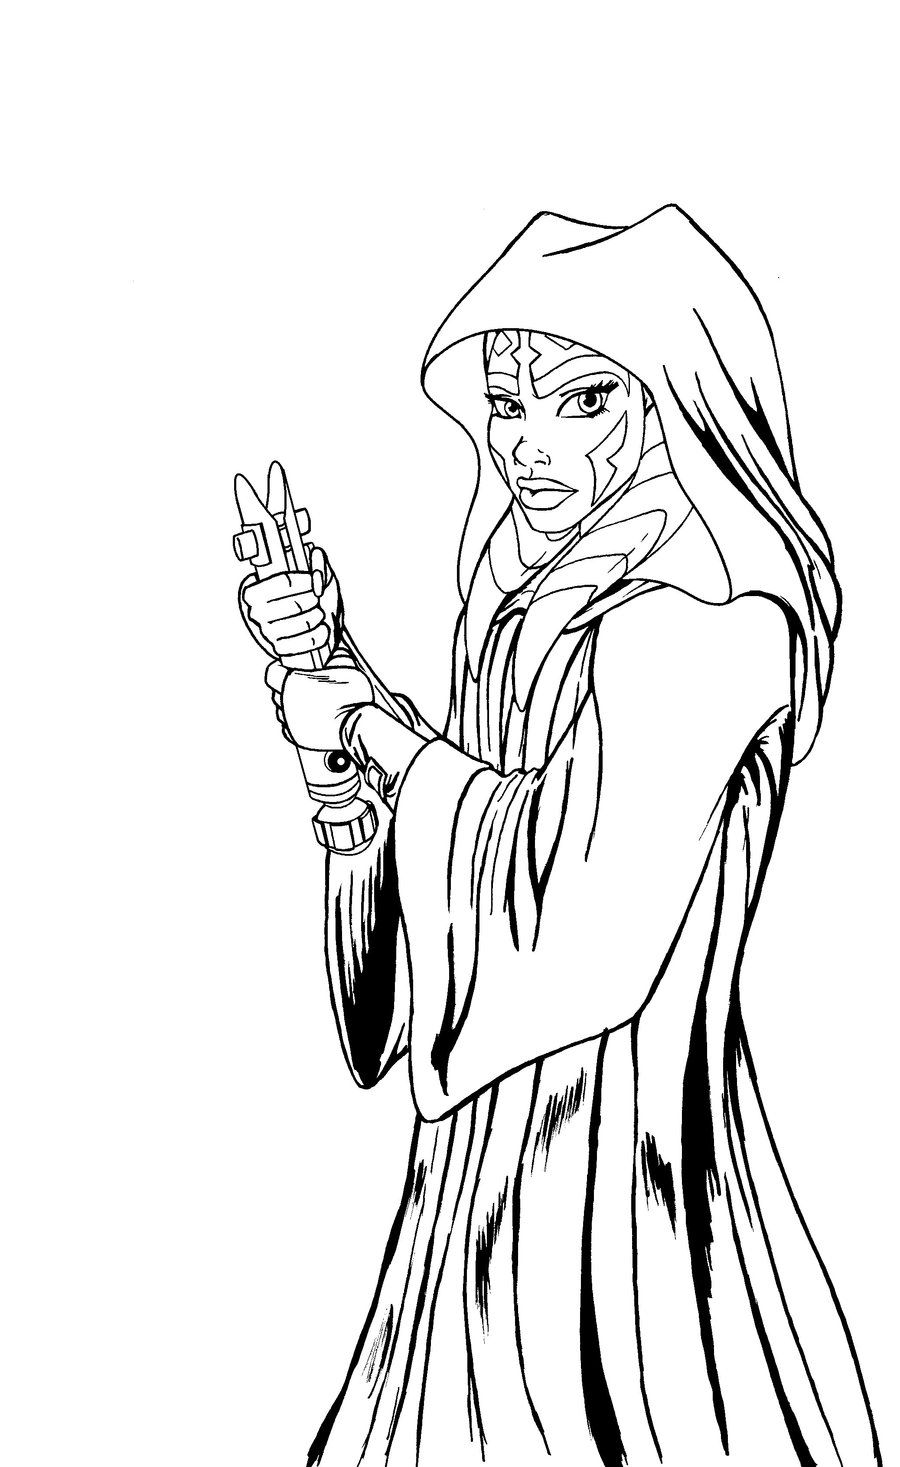 Ahsoka Tano Robed Lineart By Josephb222 Deviantart Com On Deviantart Star Wars Coloring Book Star Wars Drawings Star Wars Fan Art